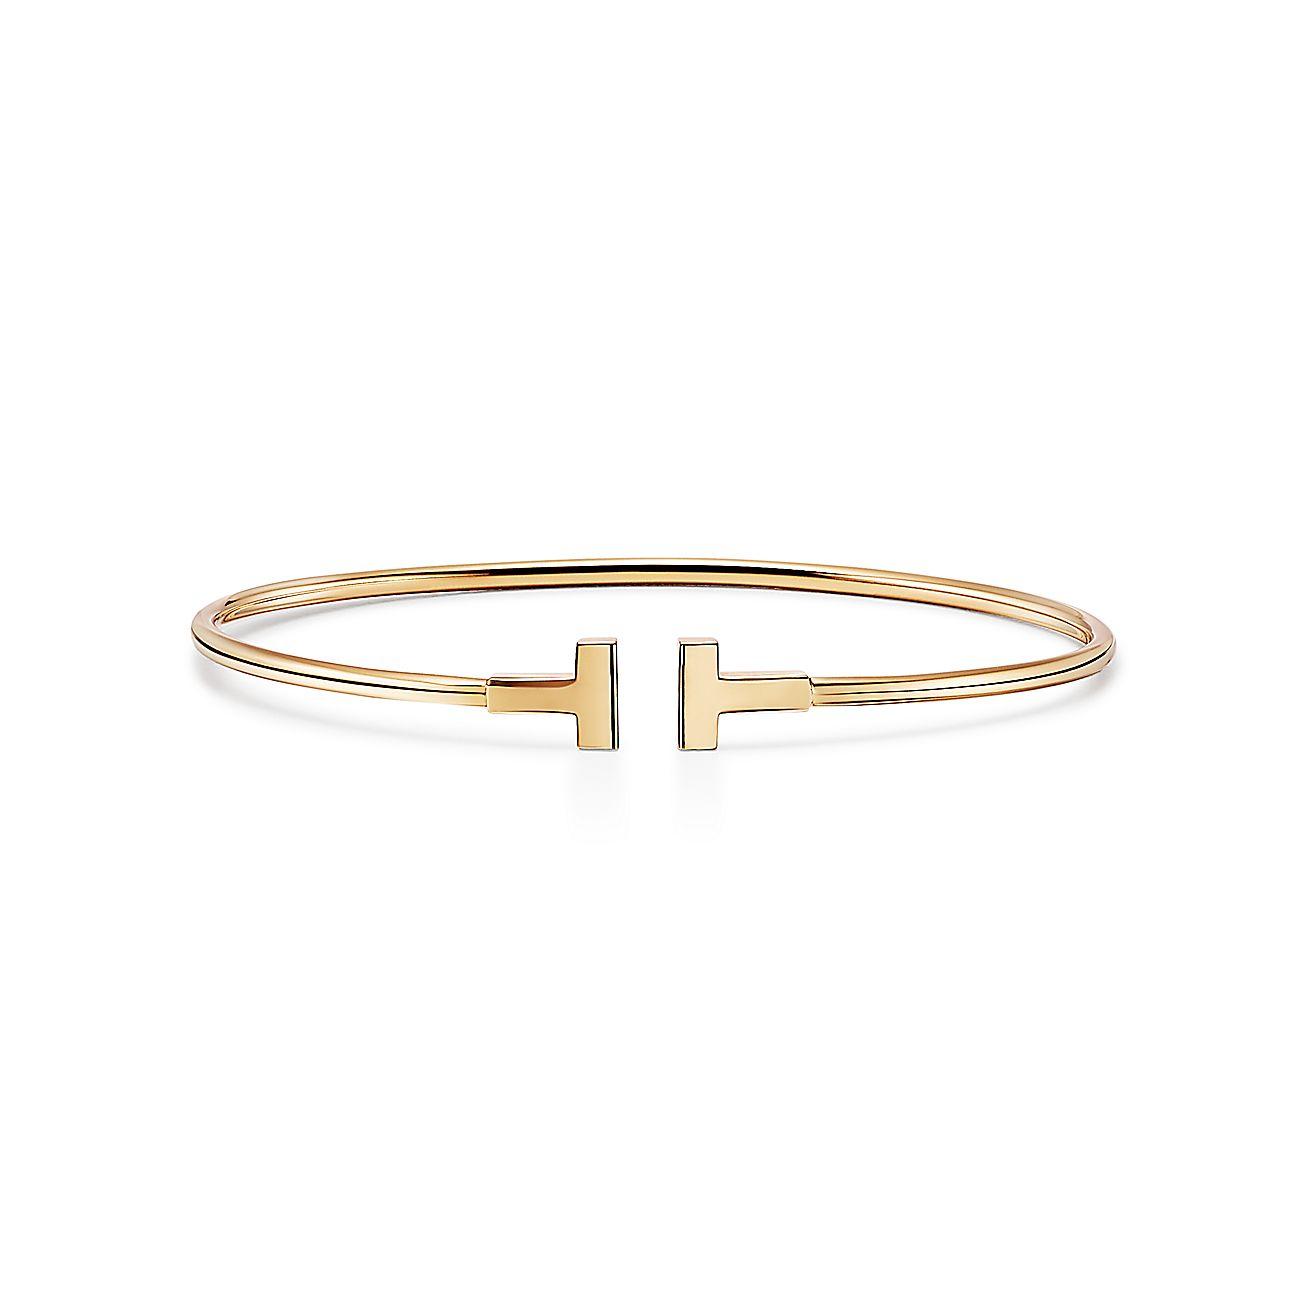 Tiffany T Narrow Wire Bracelet In 18k Gold Medium Tiffany Co